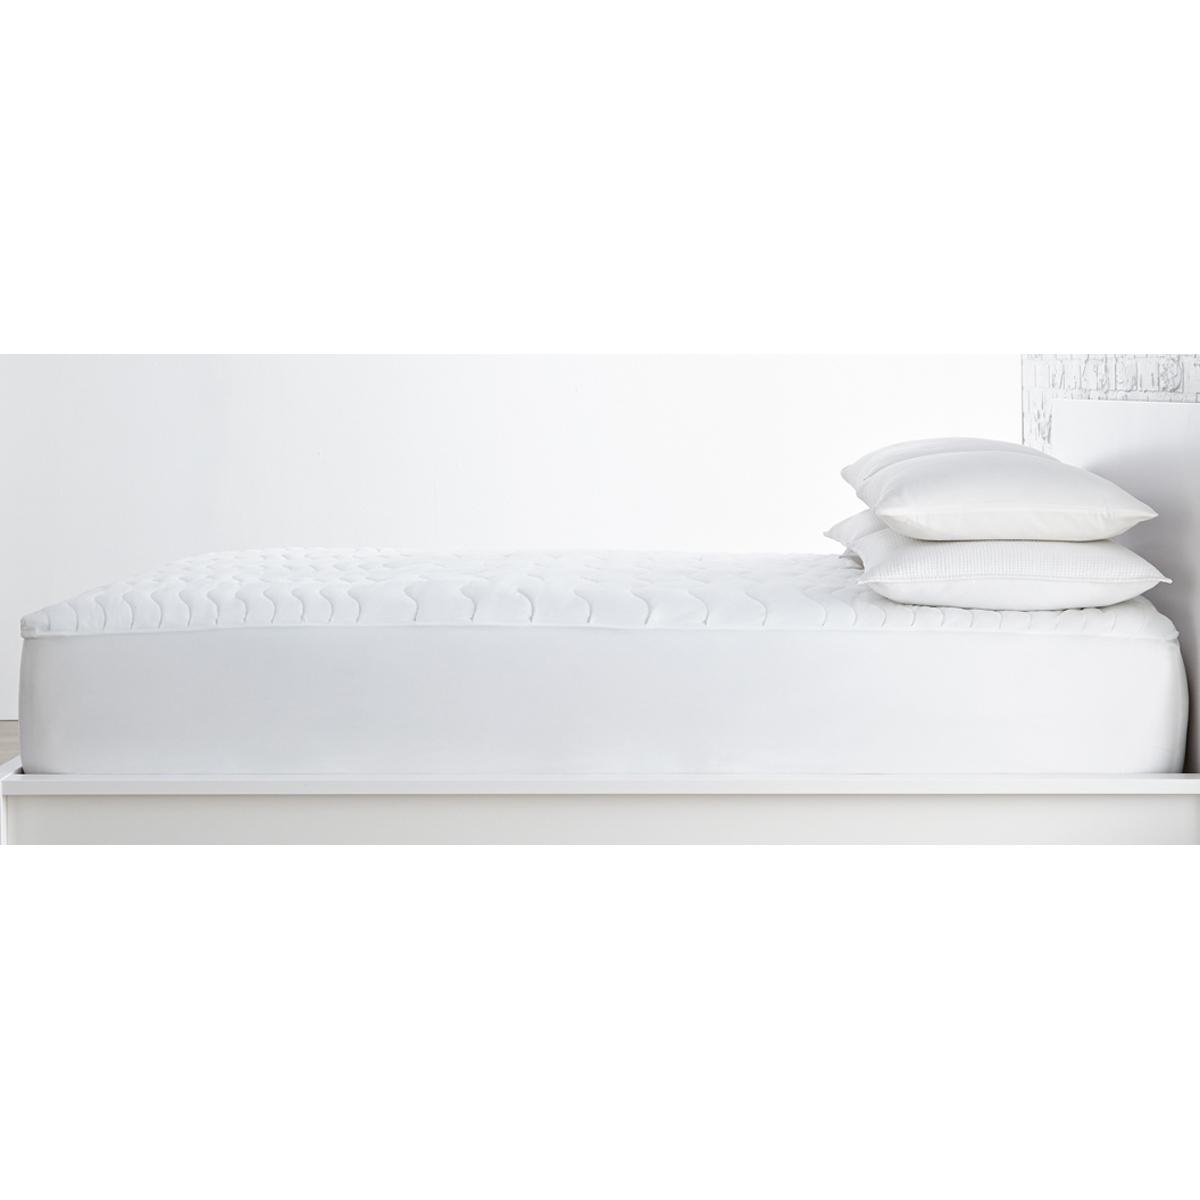 Sunbeam health™ RESTORE™ Heated Mattress Pad, Queen Size